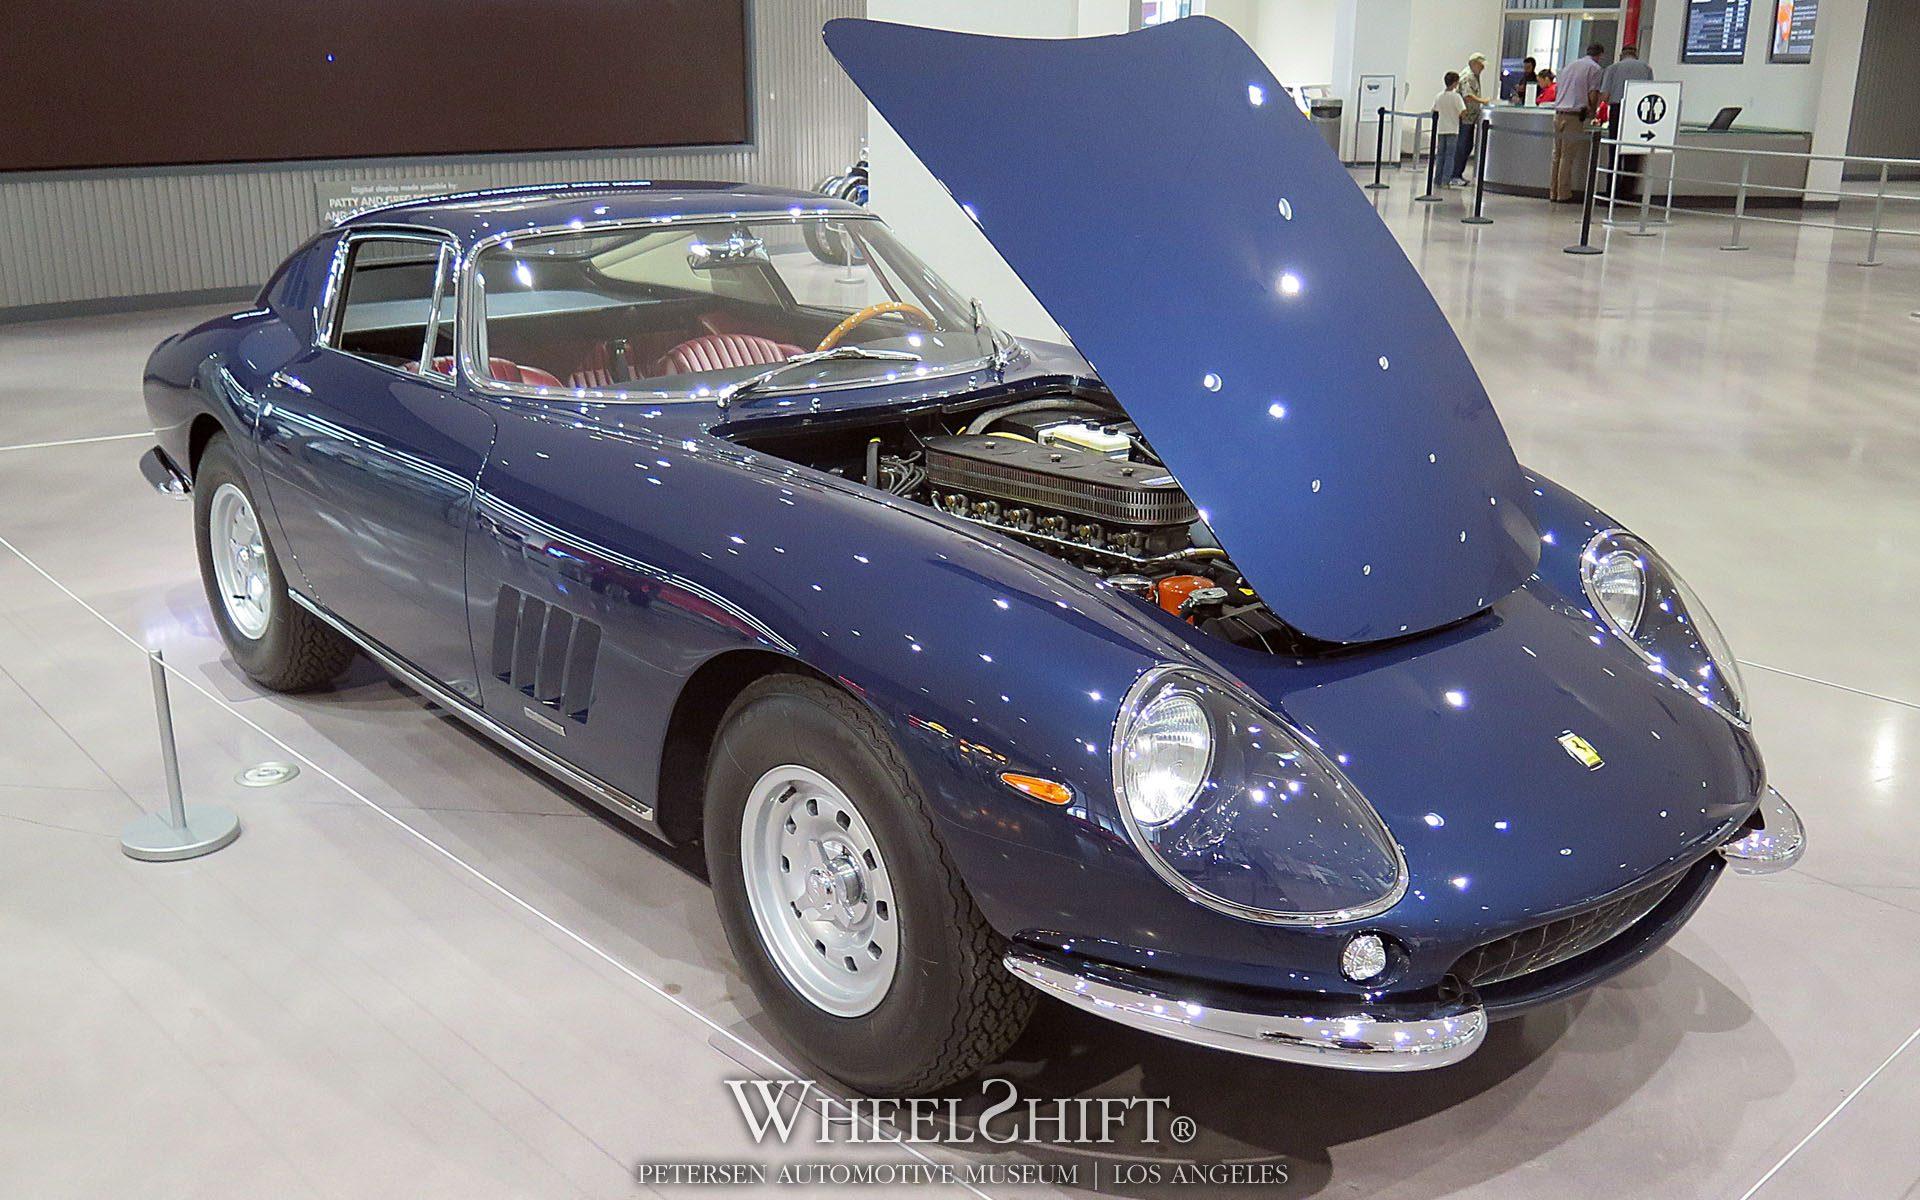 Petersen Automotive Museum (Los Angeles)